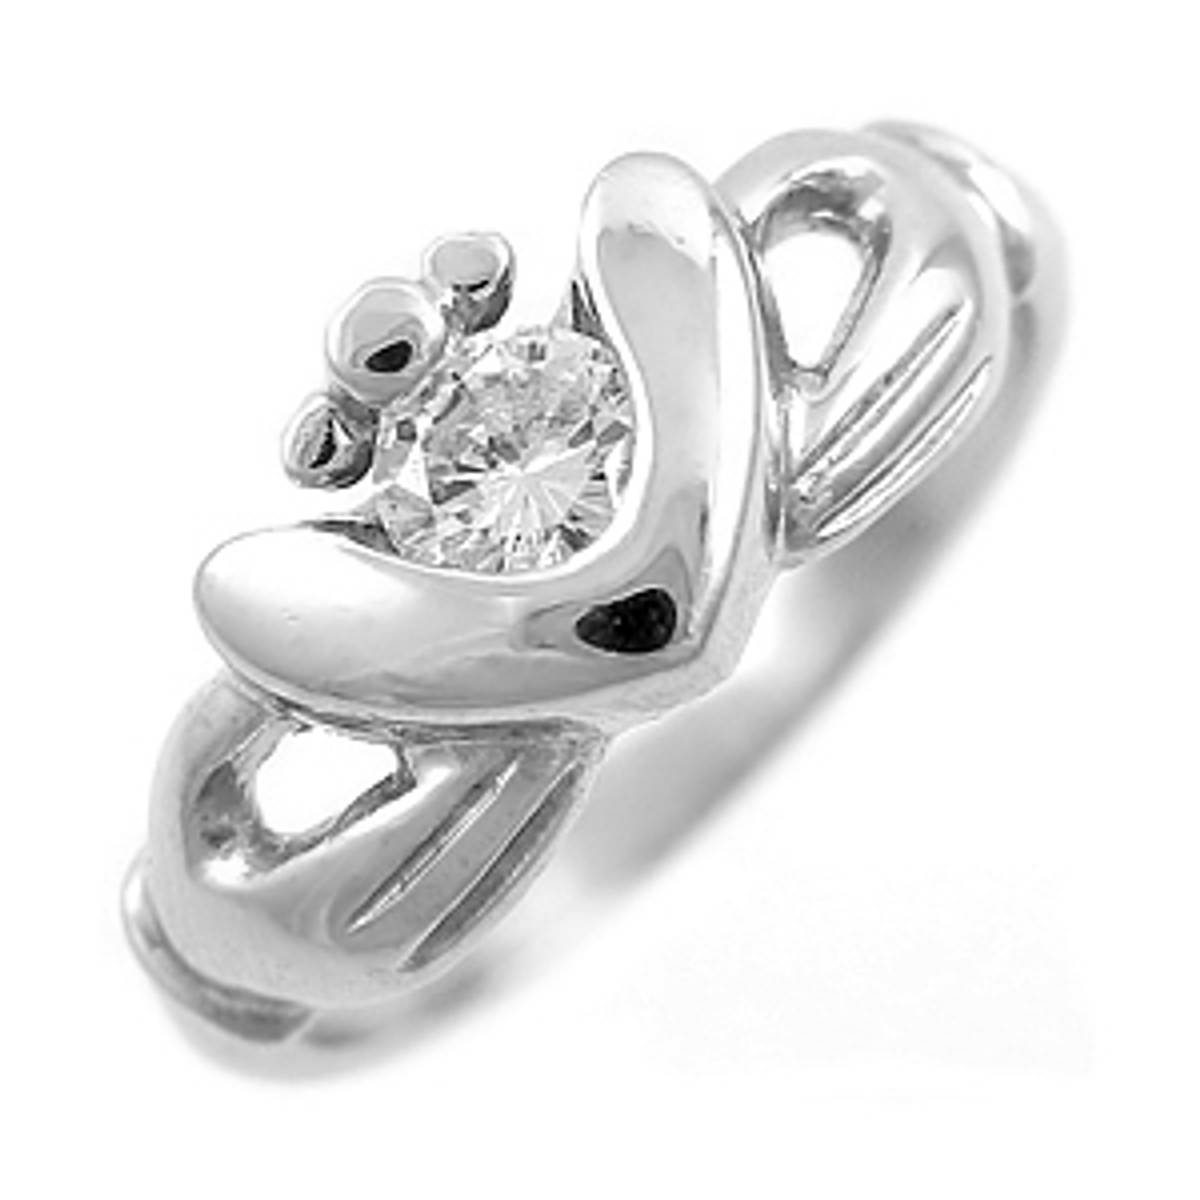 Irish made14 carat white gold 0.10cts diamond claddagh engagement ring